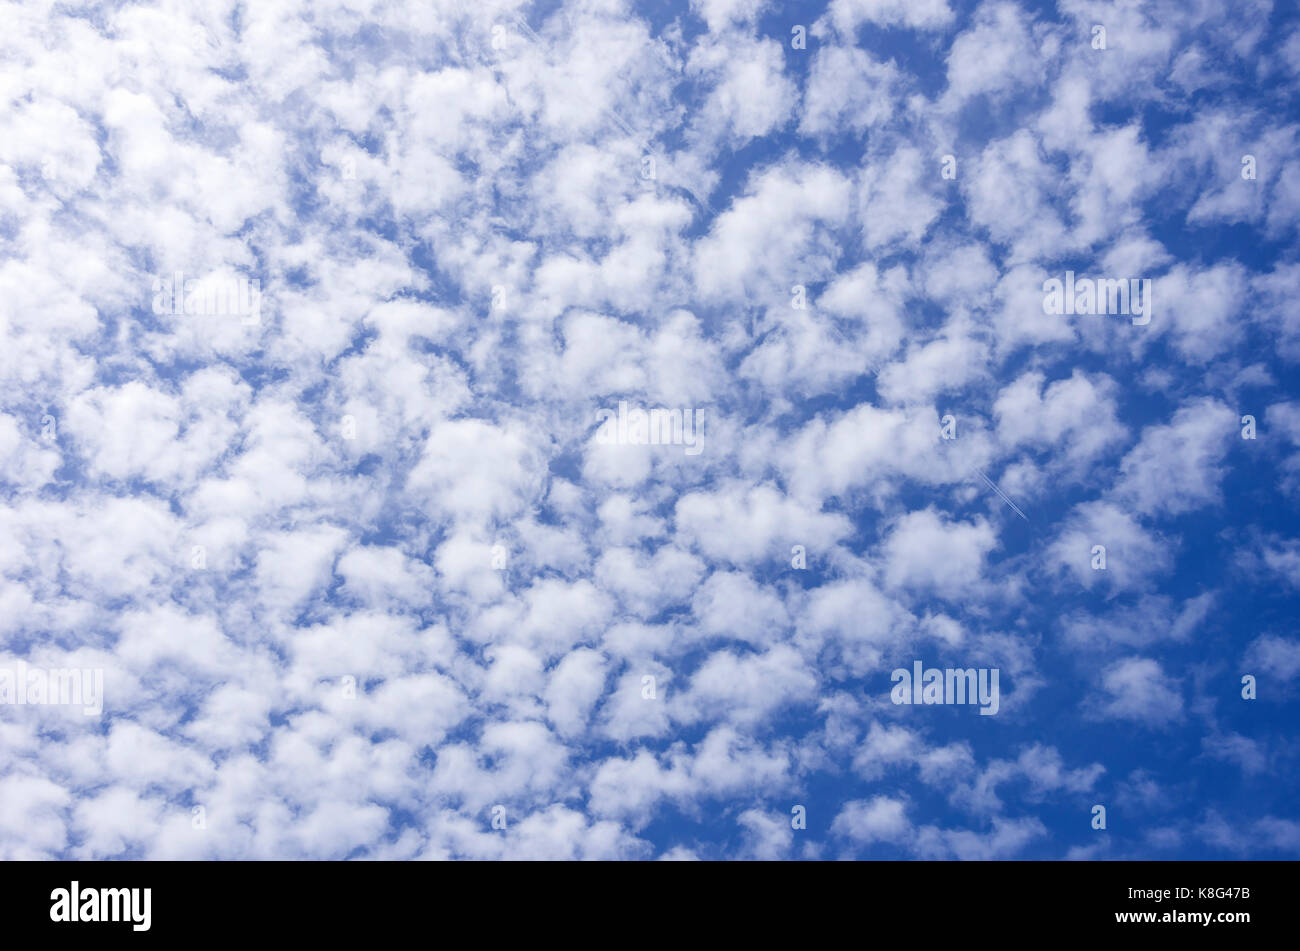 Mackerel sky cloud formation. - Stock Image